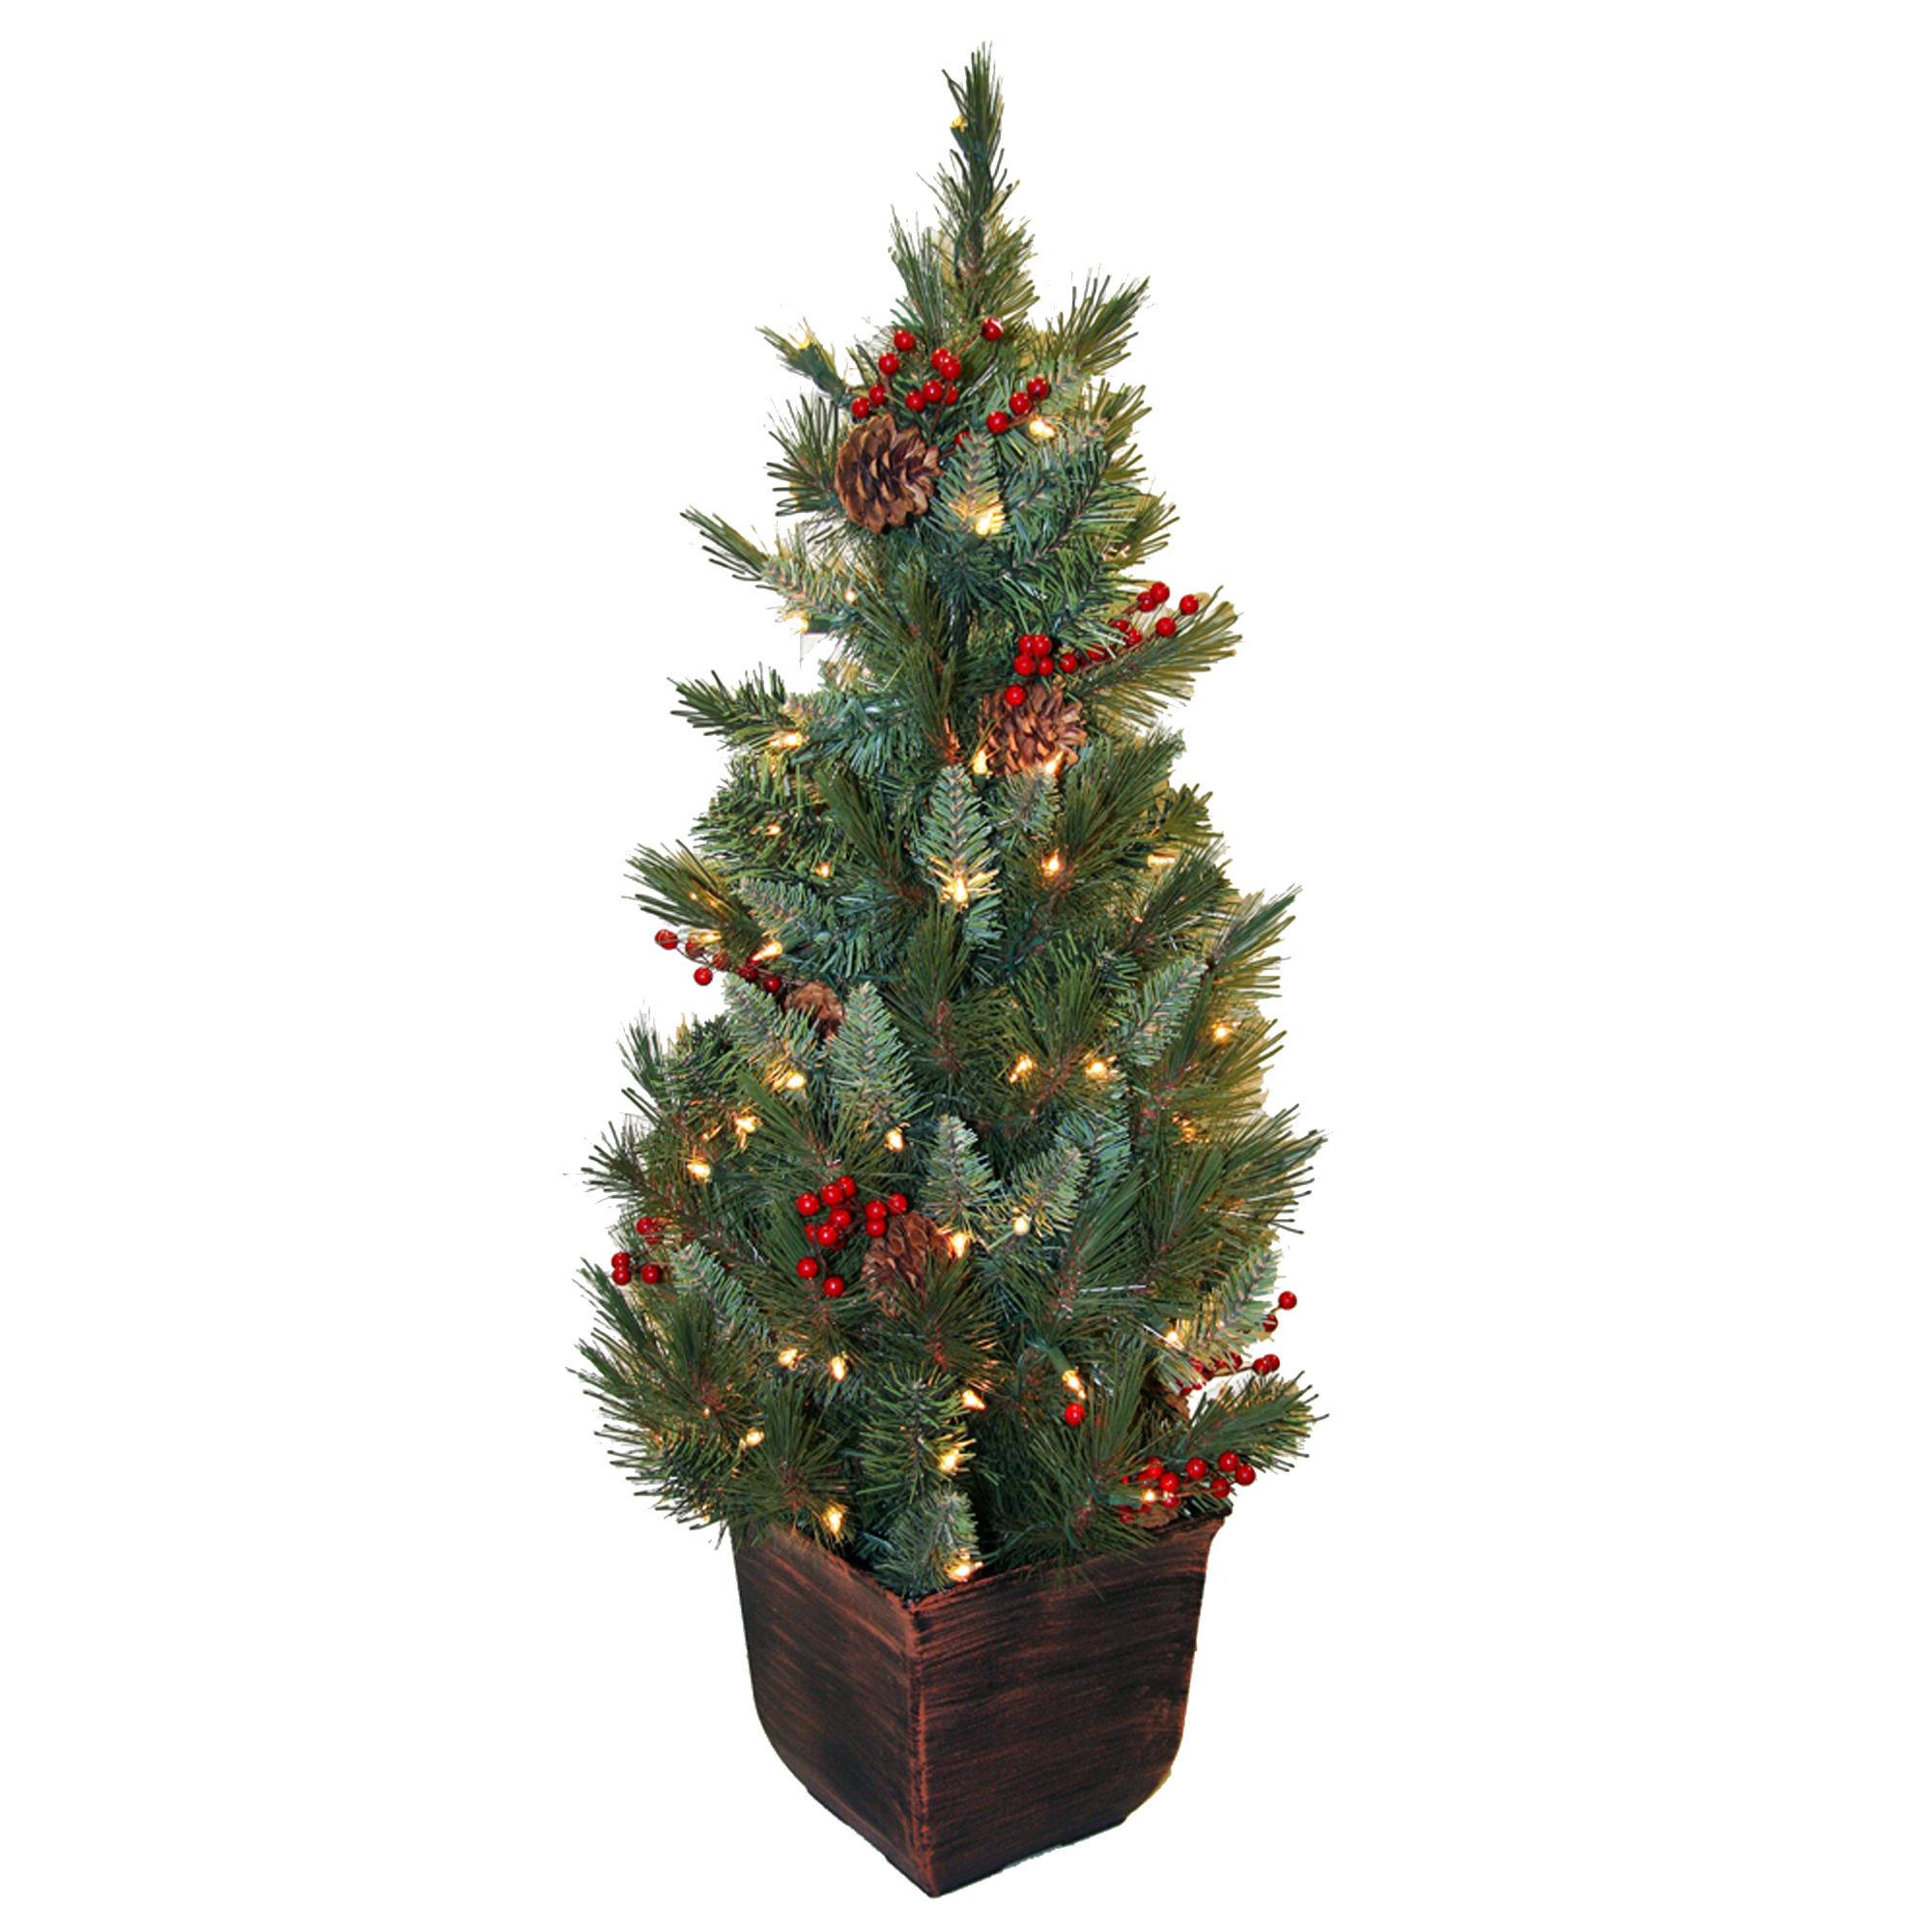 4' Pre-Lit Potted Christmas Tree